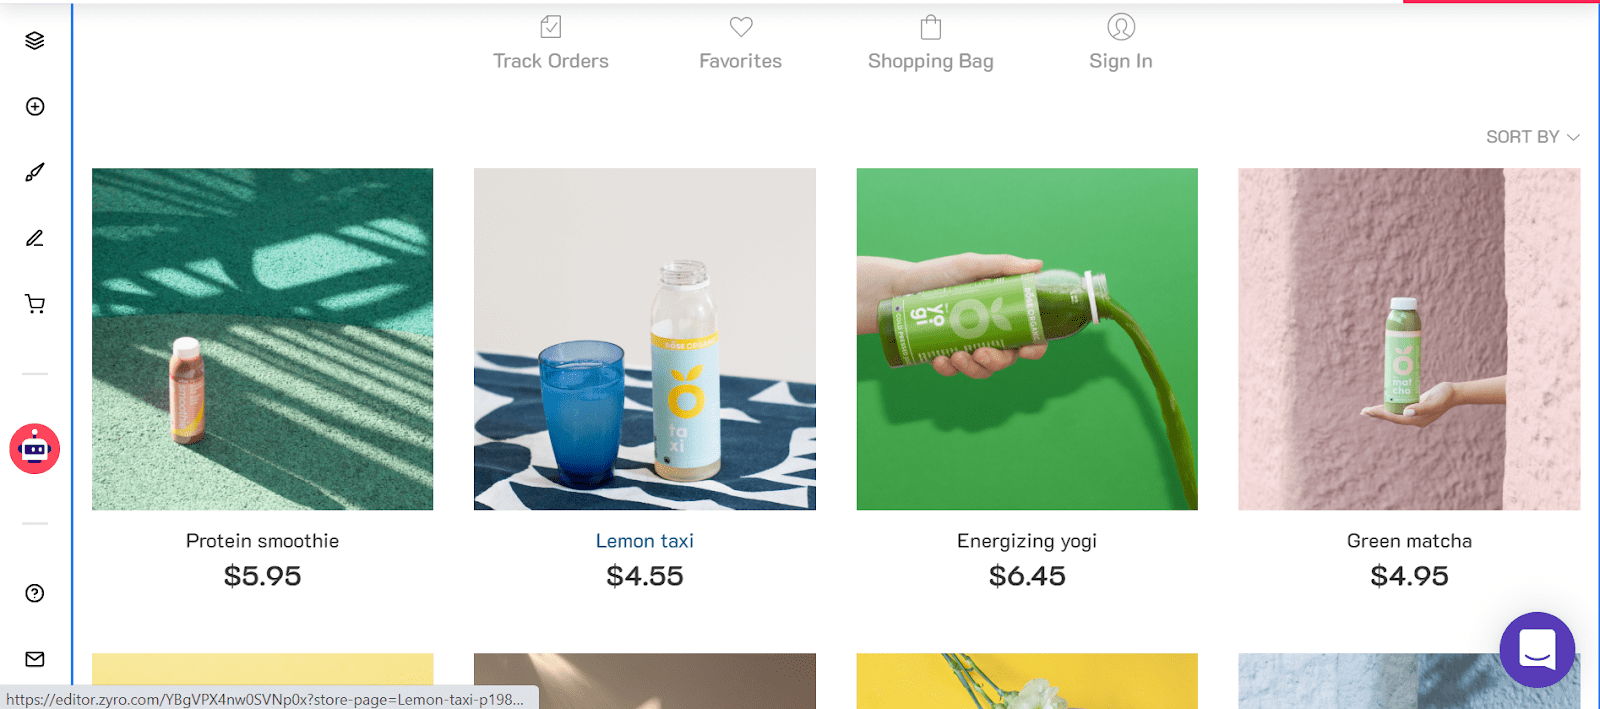 Zyro online store